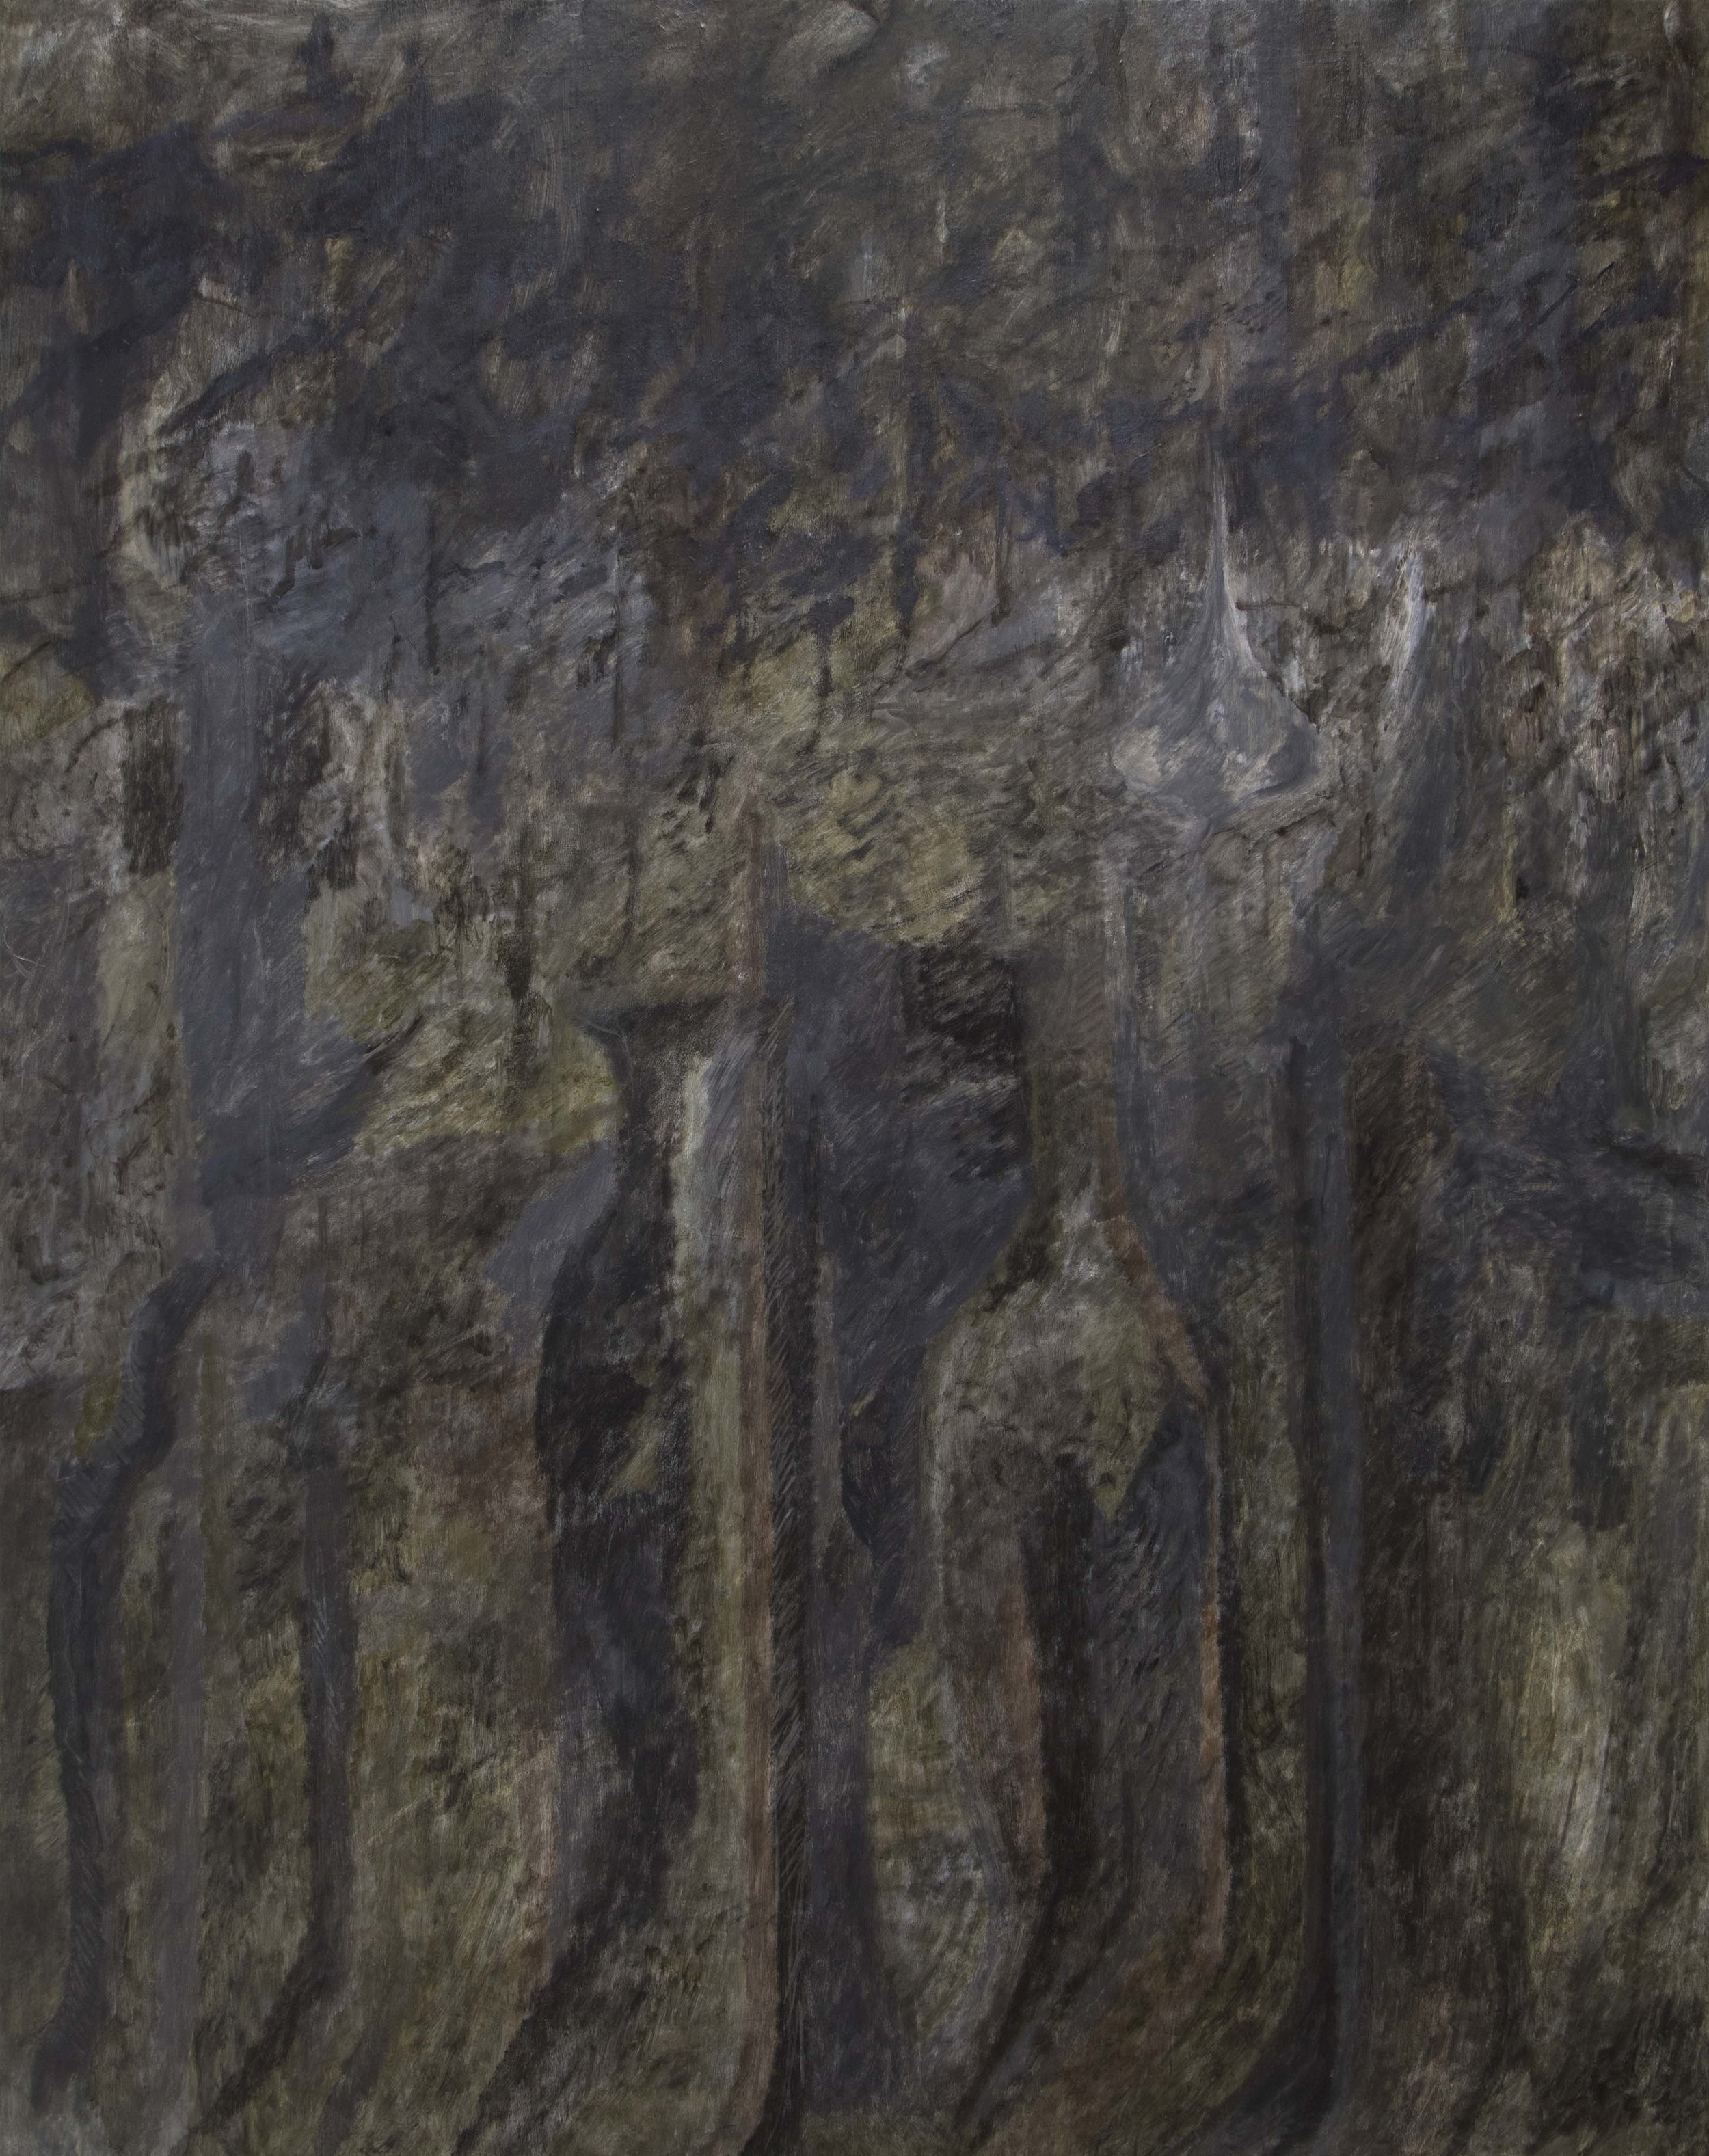 Tim Buckovic, Black untitled, 2017, oil on linen, 190 x 150 cm